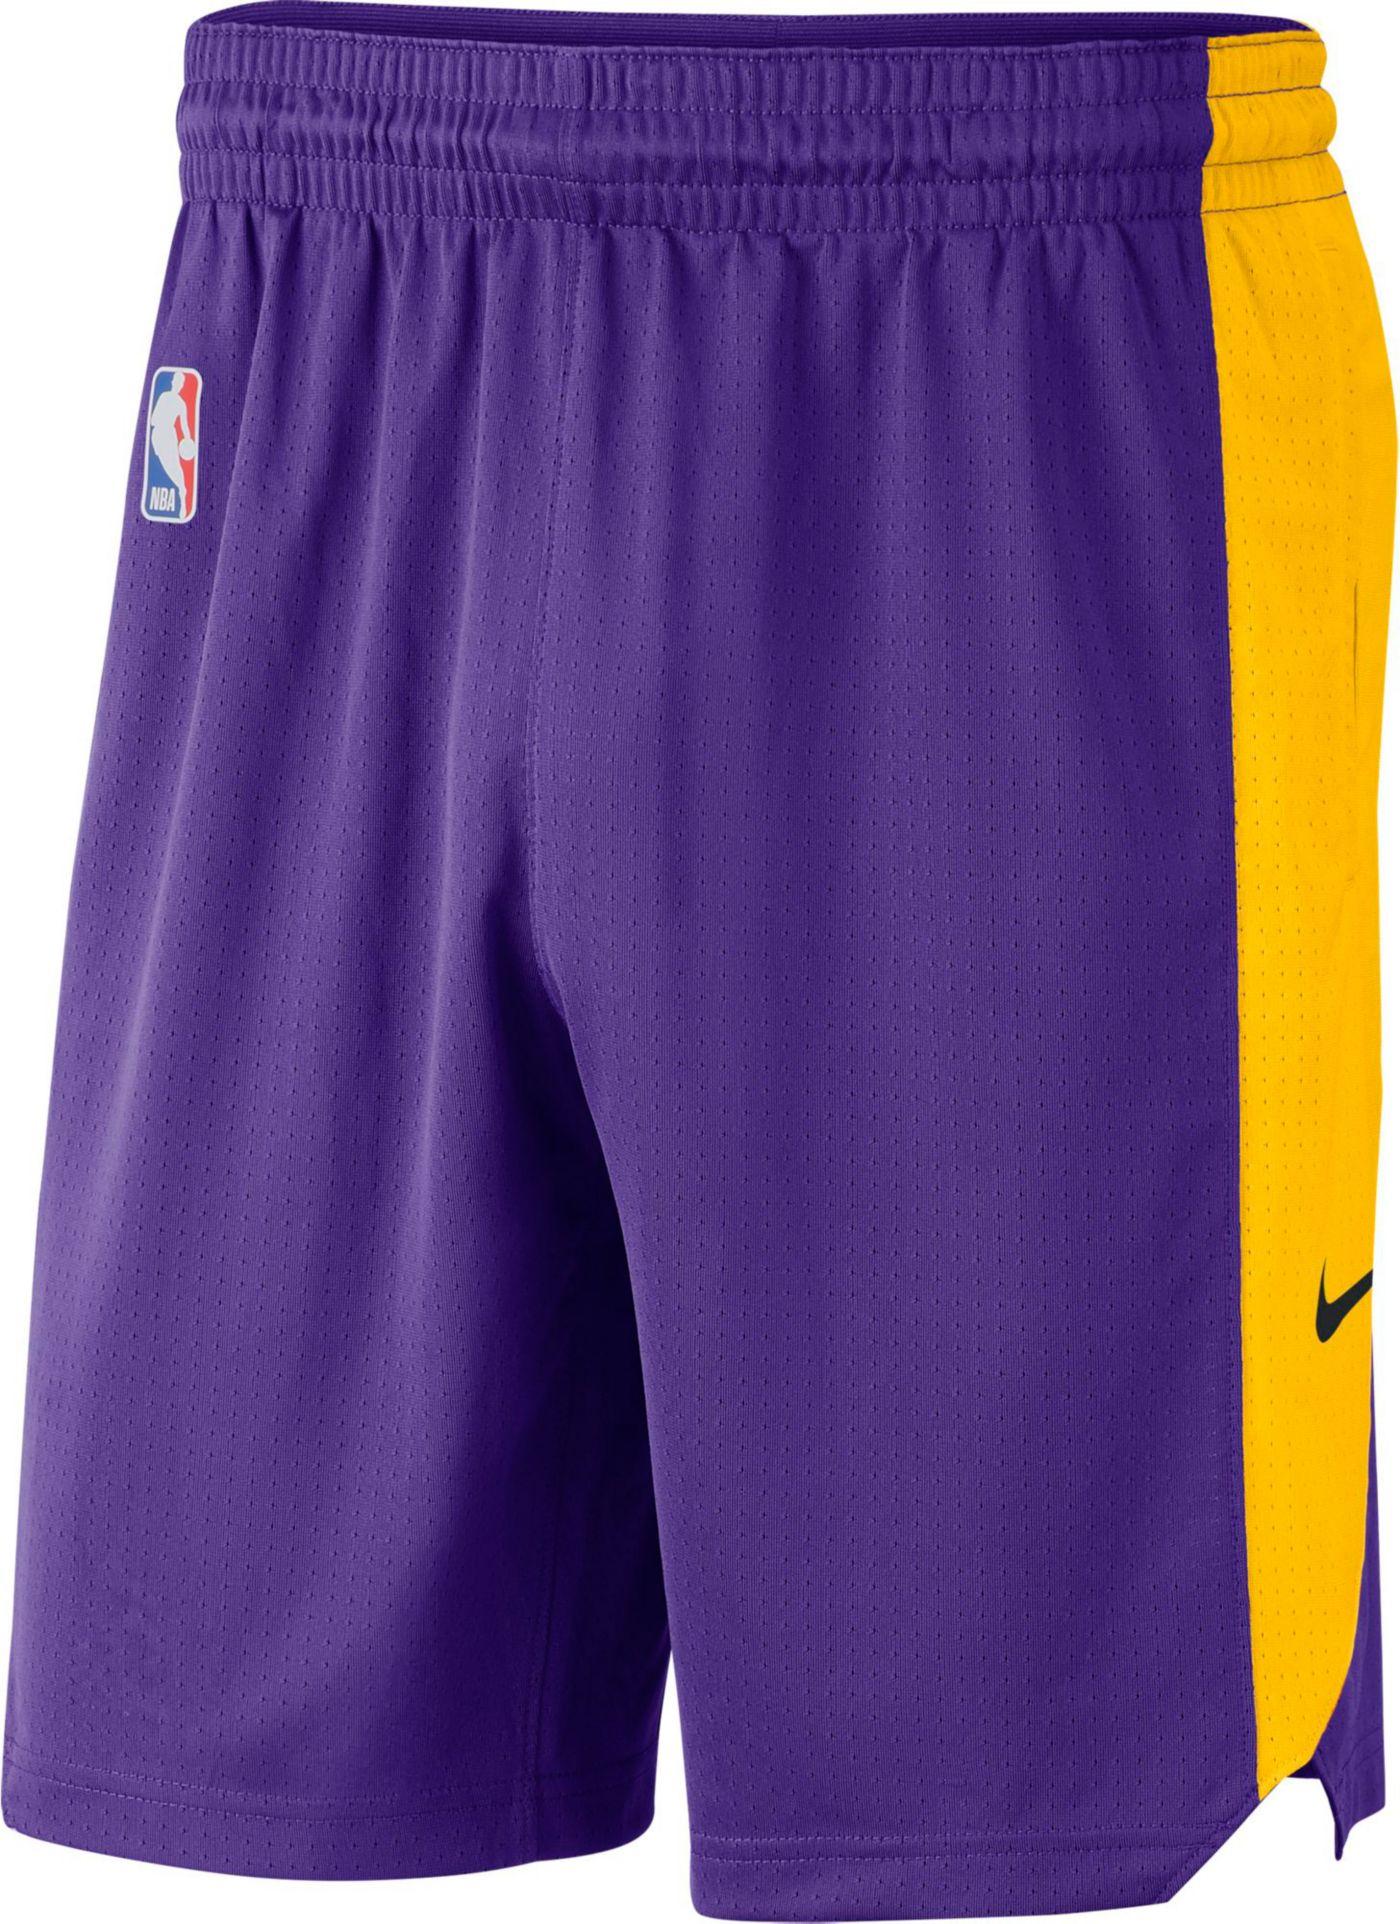 Nike Men's Los Angeles Lakers Dri-FIT Practice Shorts